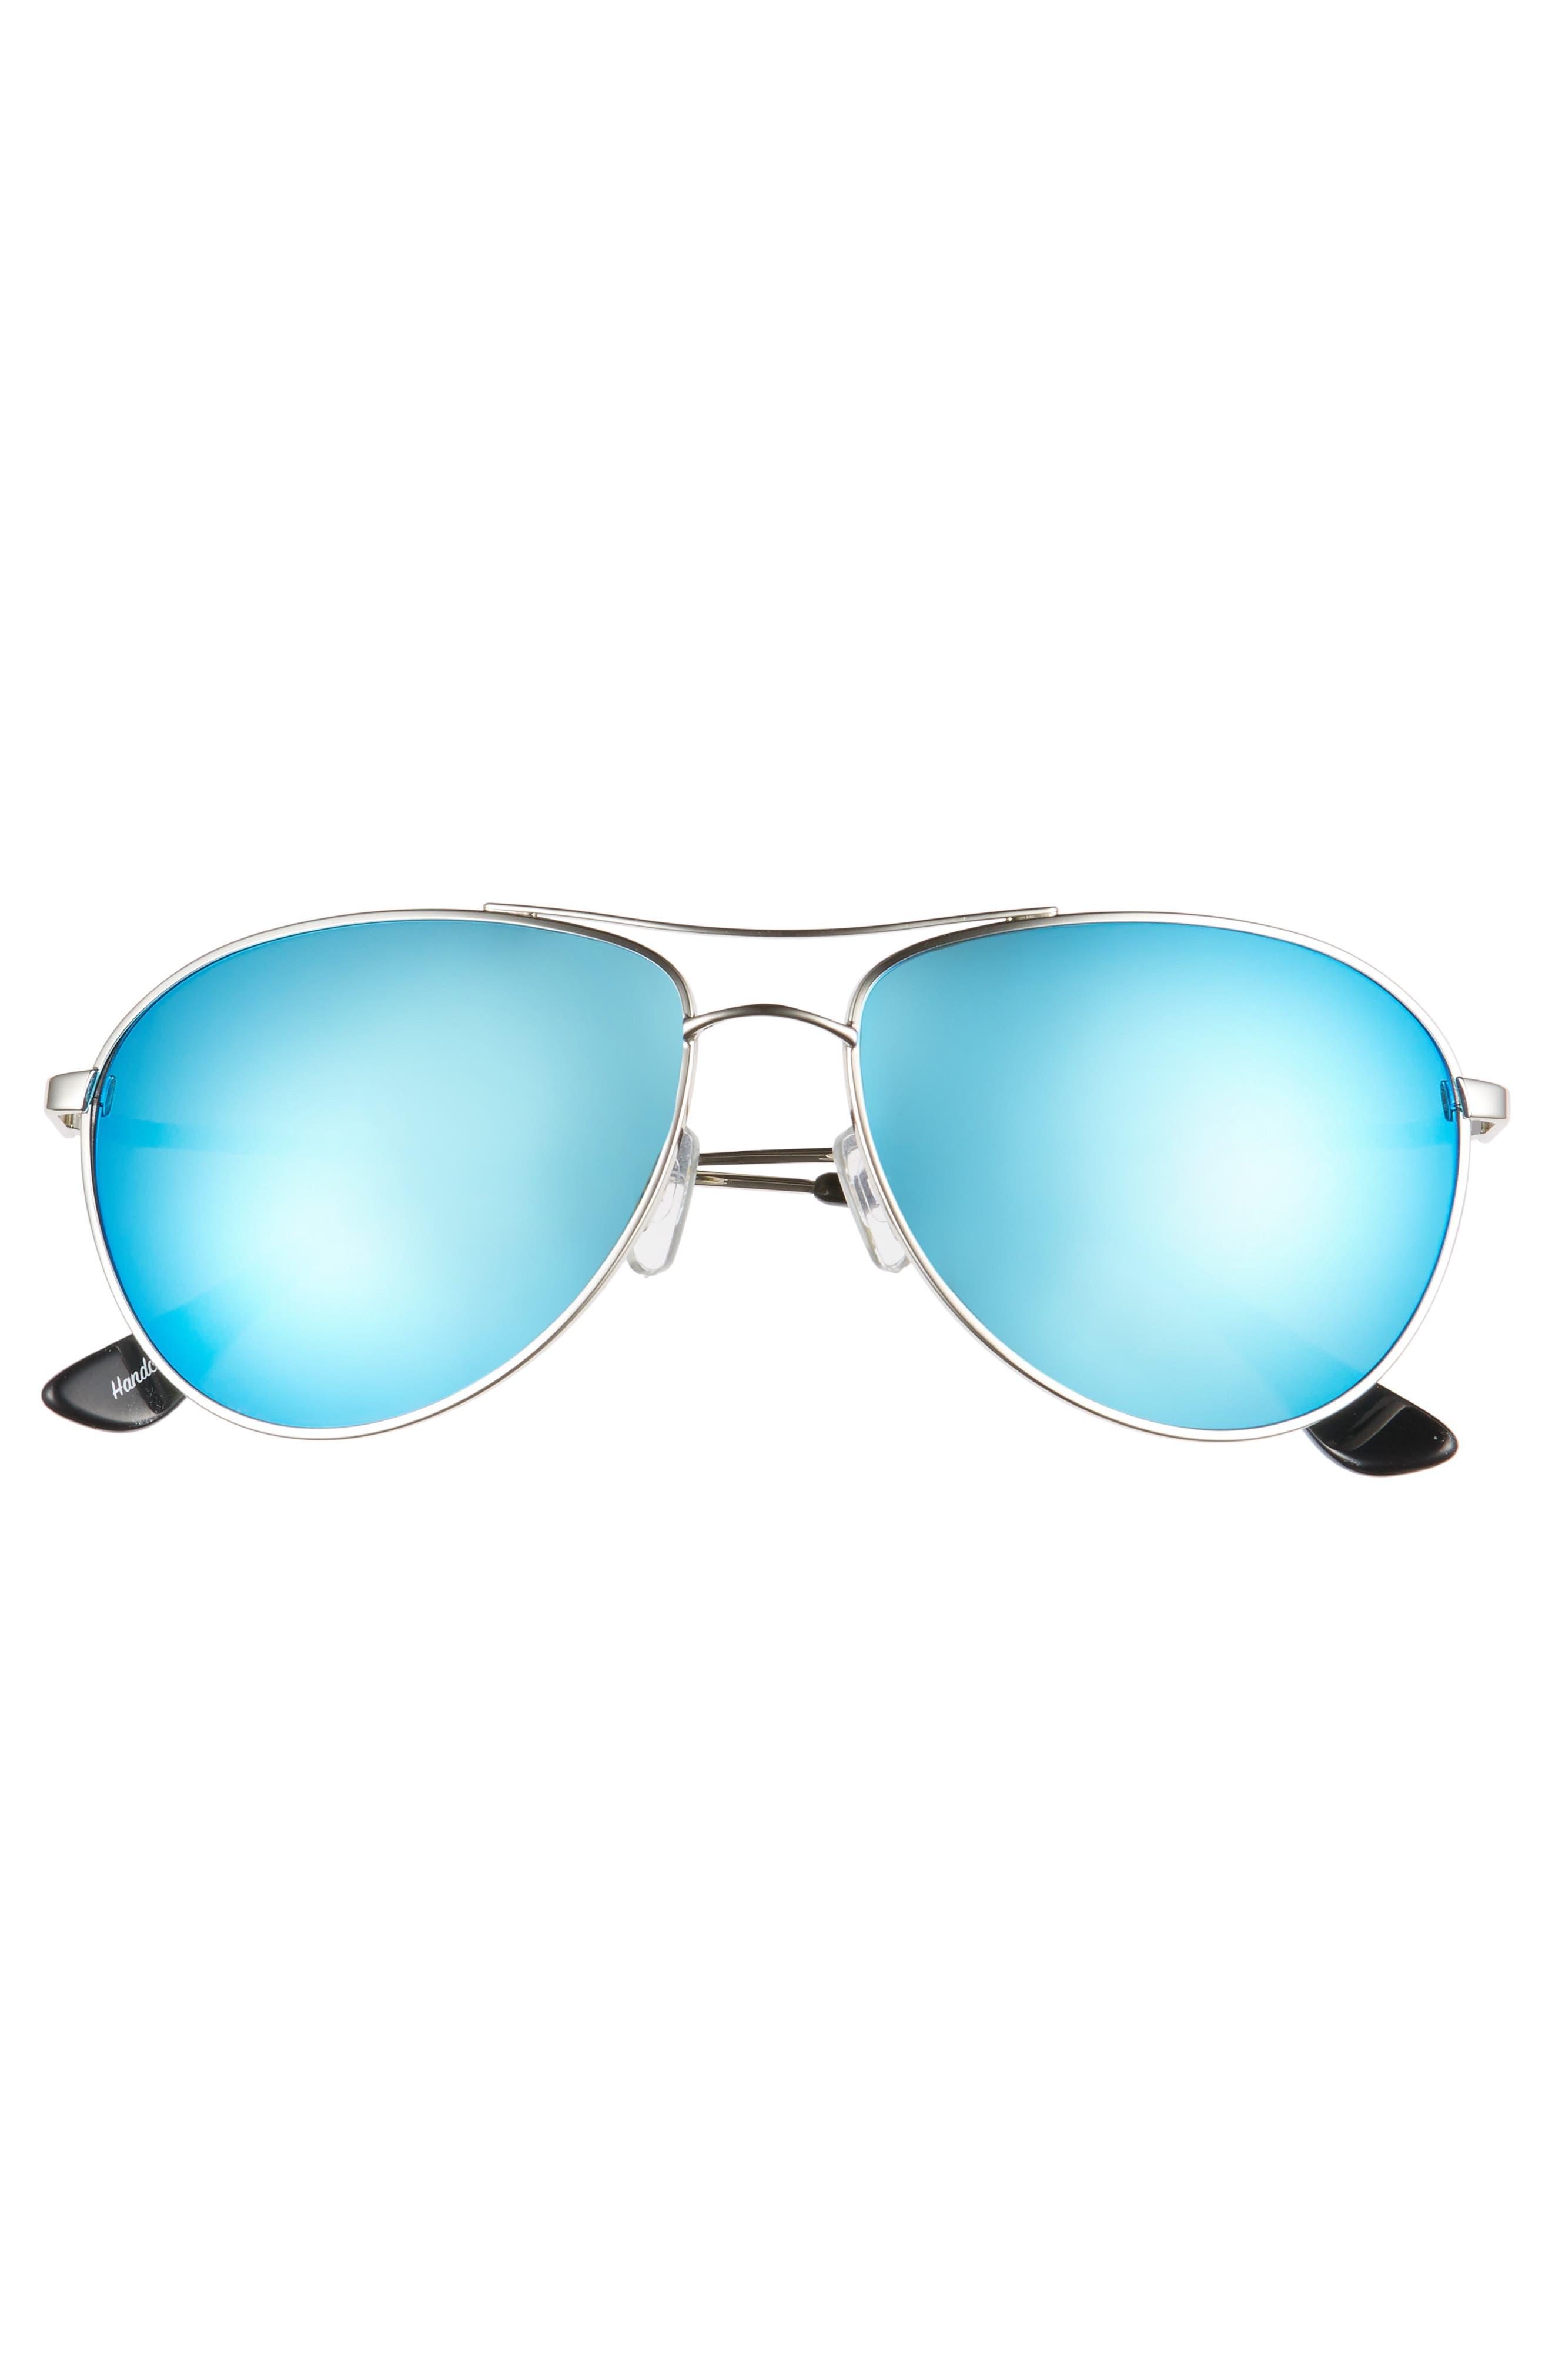 Alternate Image 3  - Brightside Orville 58mm Mirrored Aviator Sunglasses